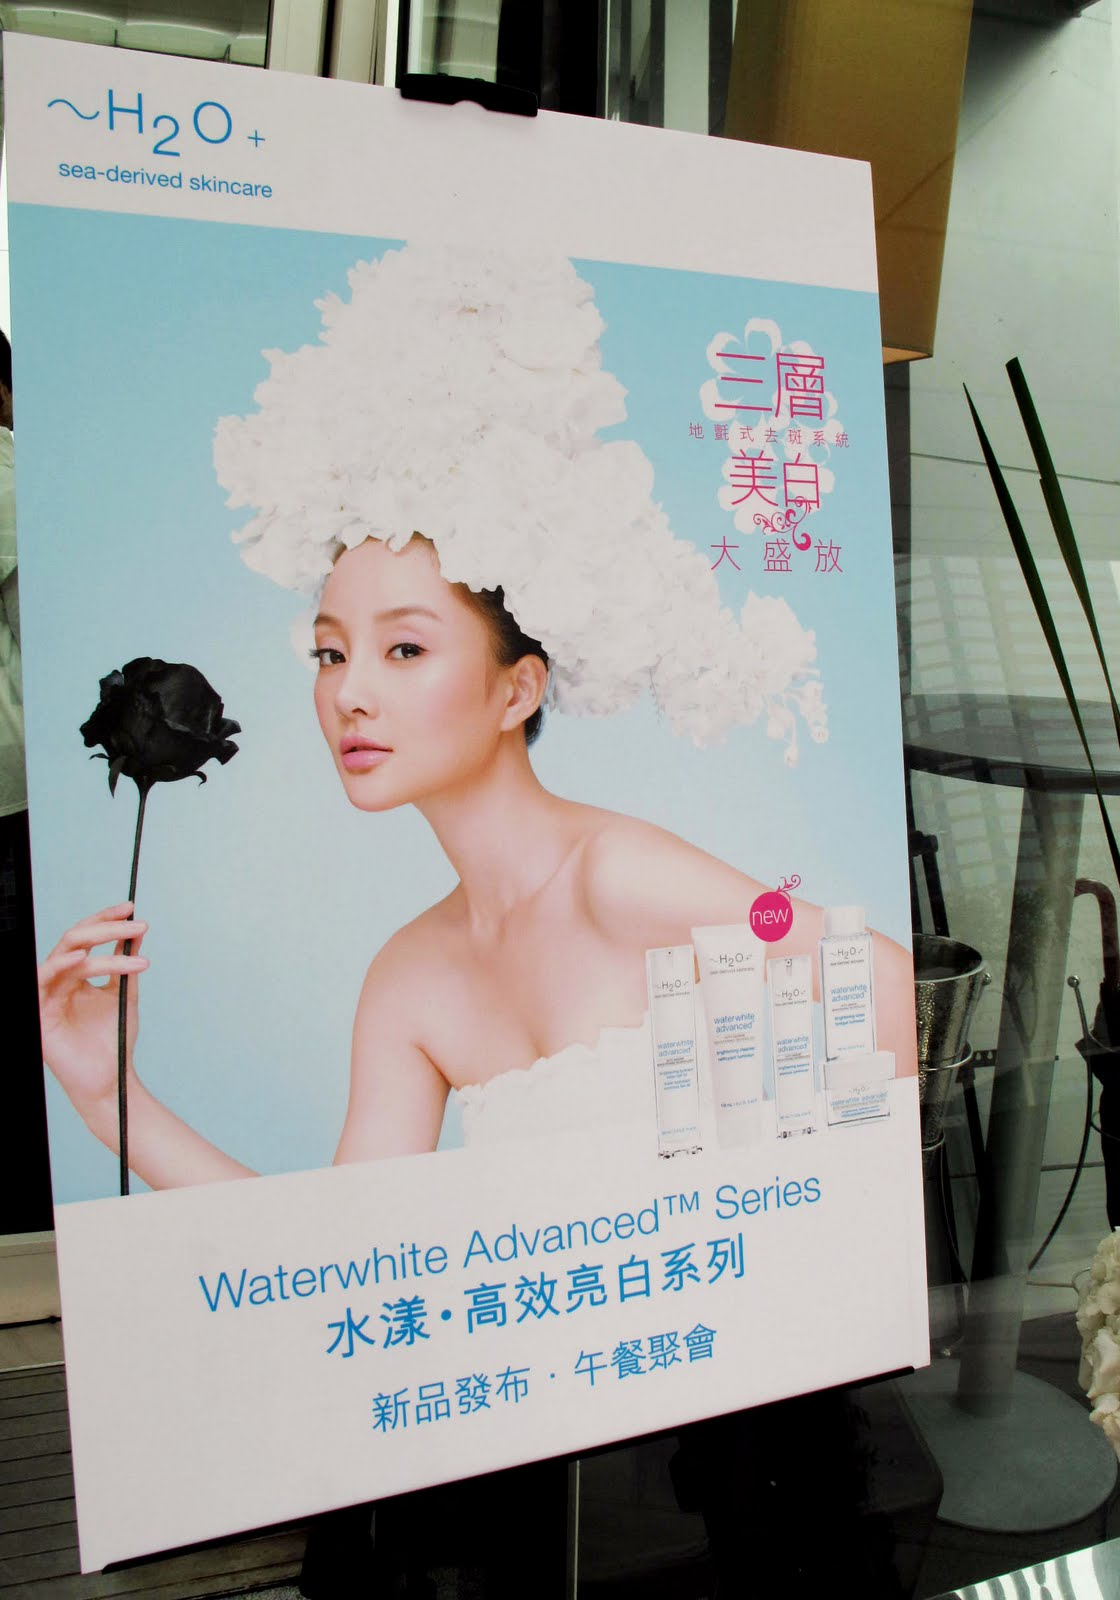 h2o oasis whitening Waterwhite Advanced Series 水漾高效亮白 精華 潔面乳 爽膚水 濕面霜 美白